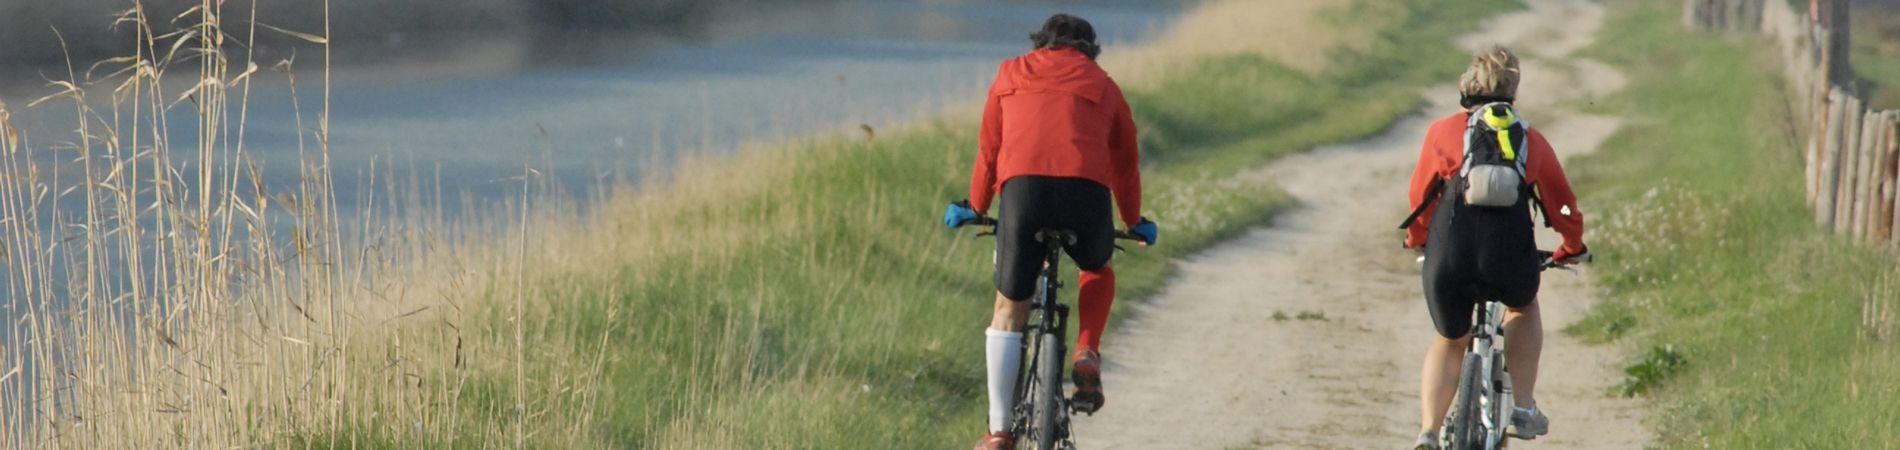 Cyclistes longeant le canal du midi